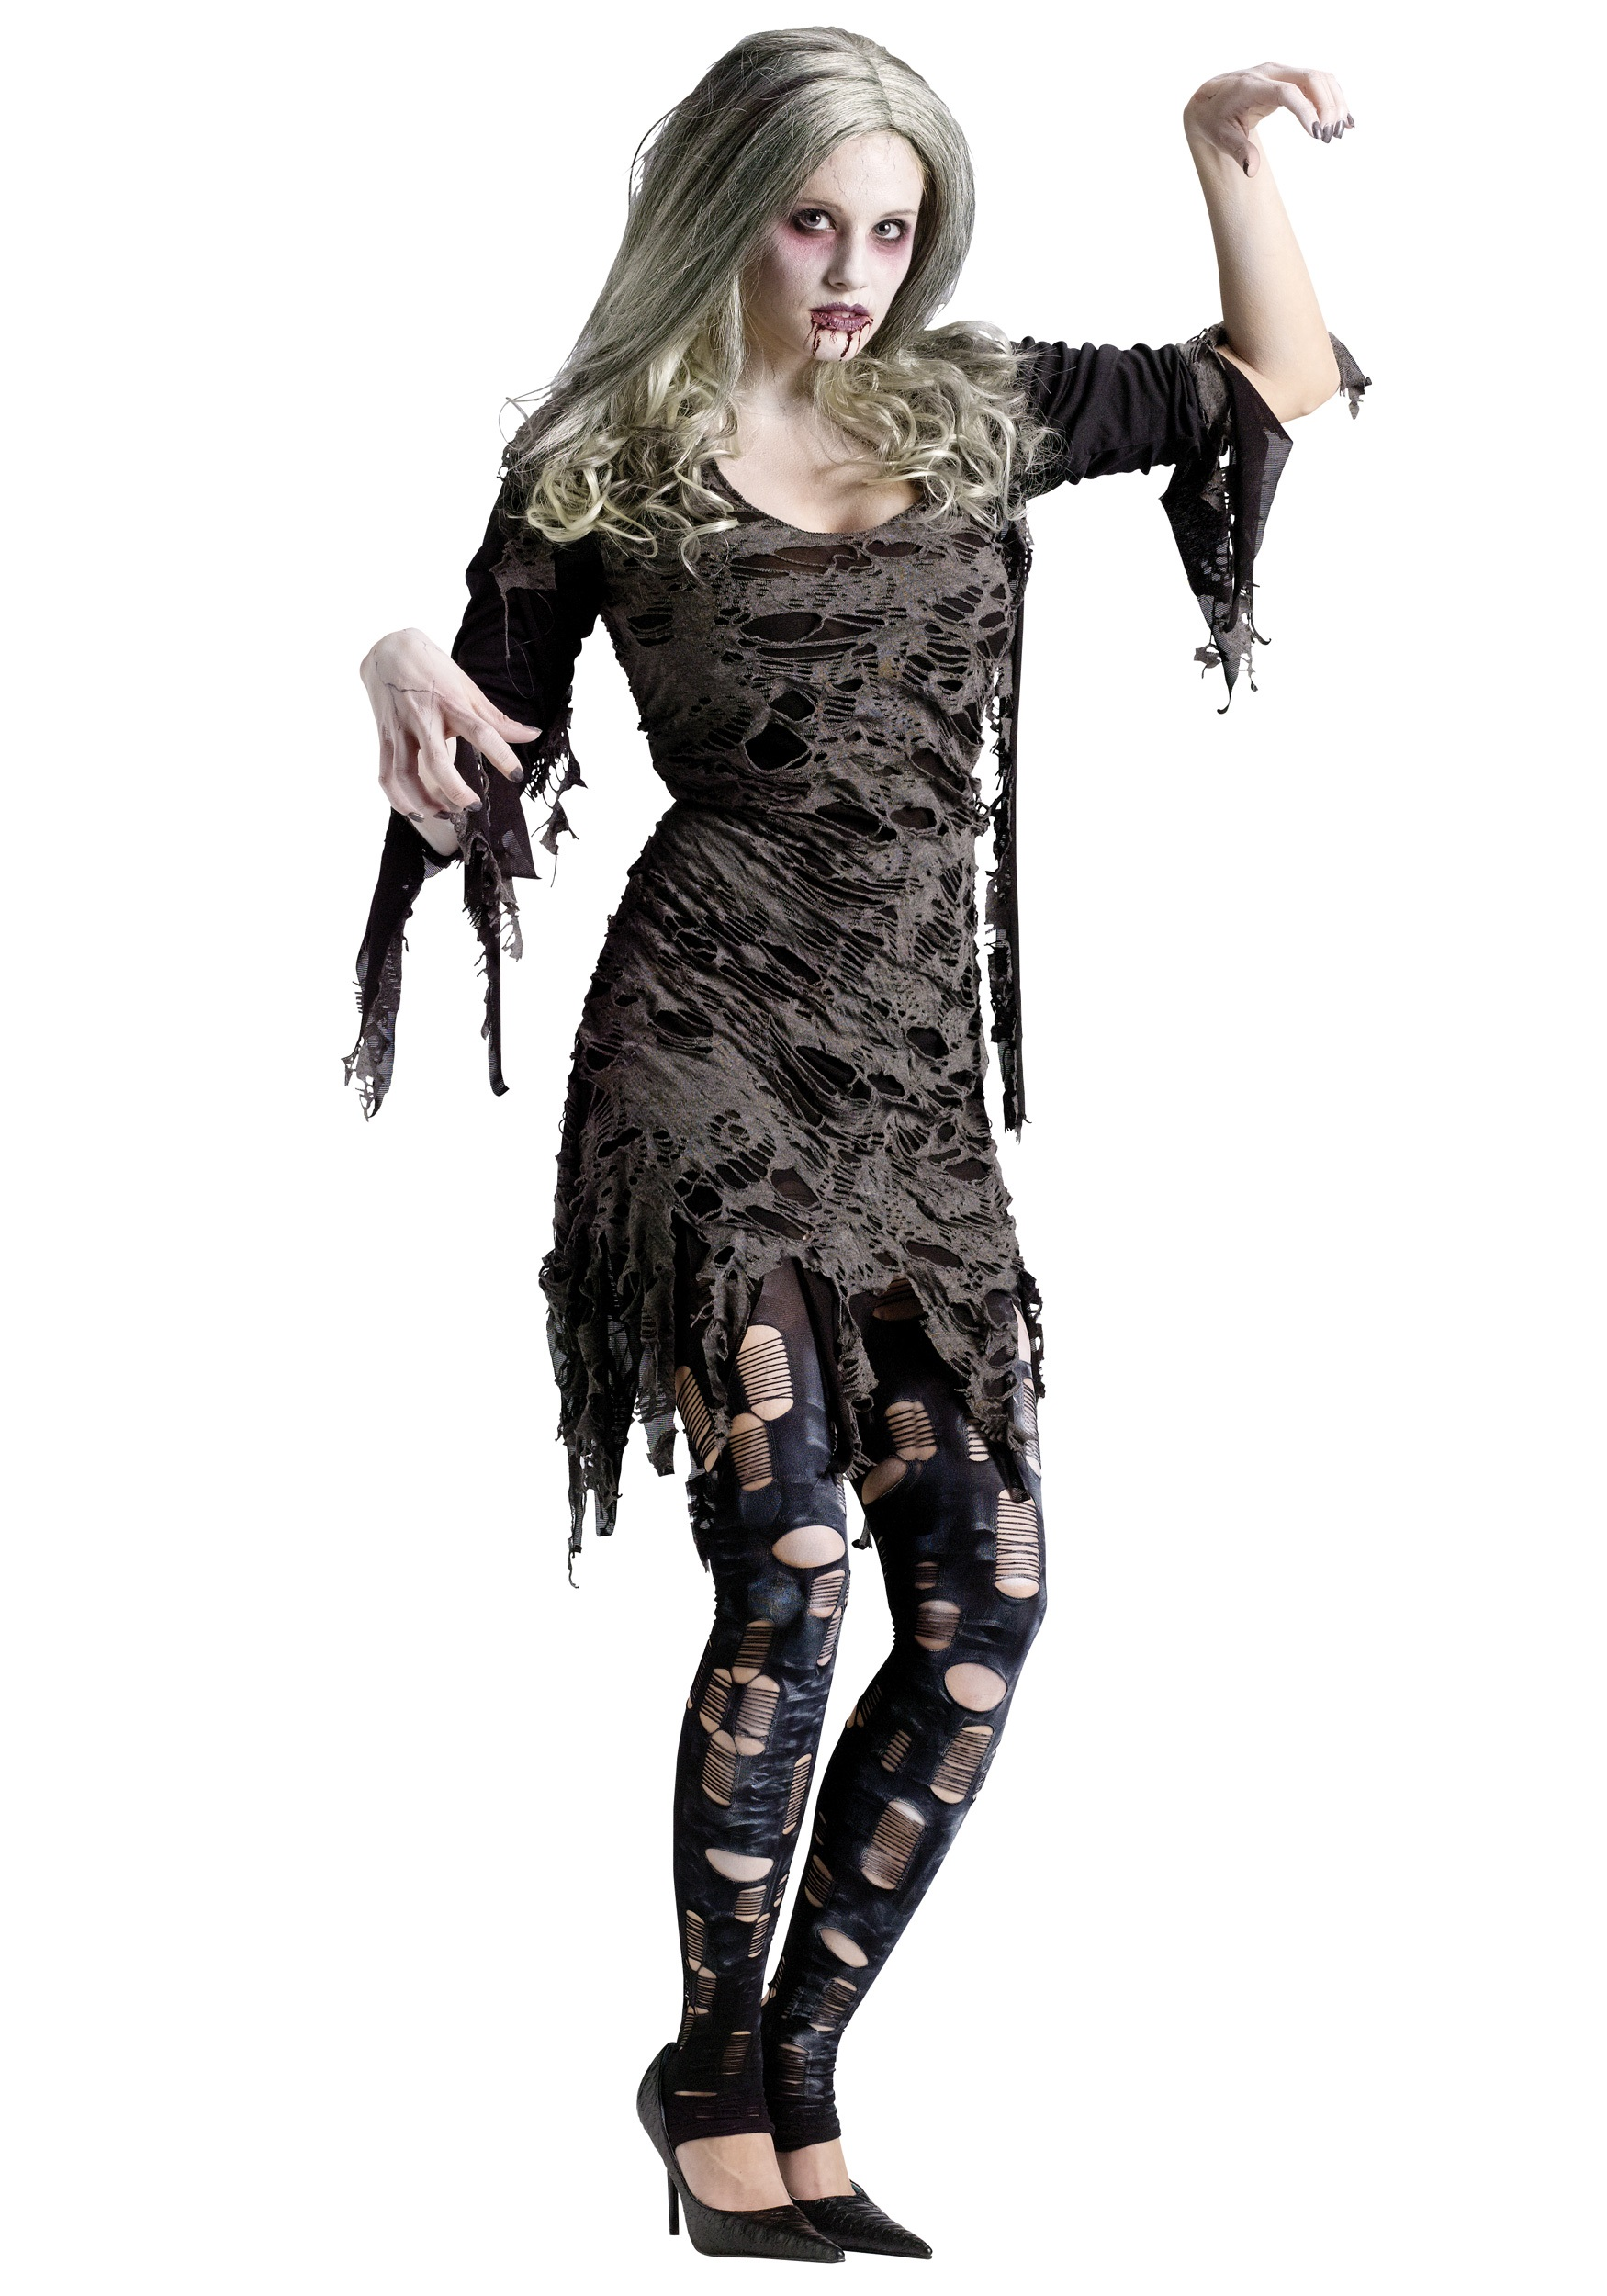 e5c43648406 Zombie Costumes & Walking Dead Costumes - HalloweenCostumes.com